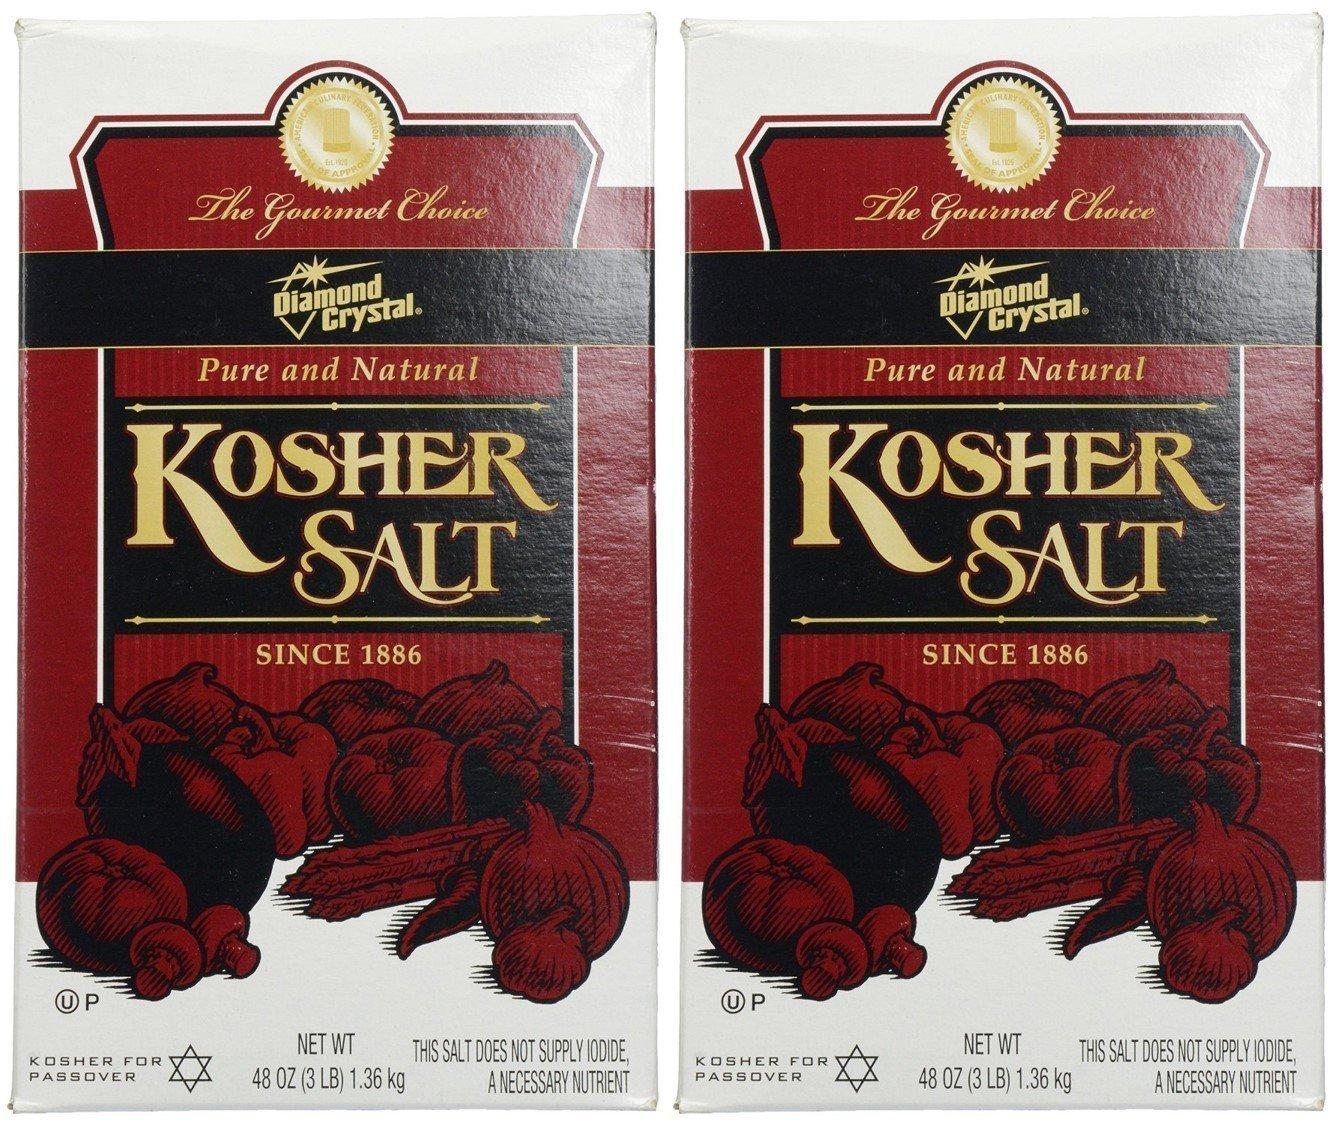 Diamond Crystal Kosher Salt, 3 lbs - Pack of 2 by Diamond (Image #1)